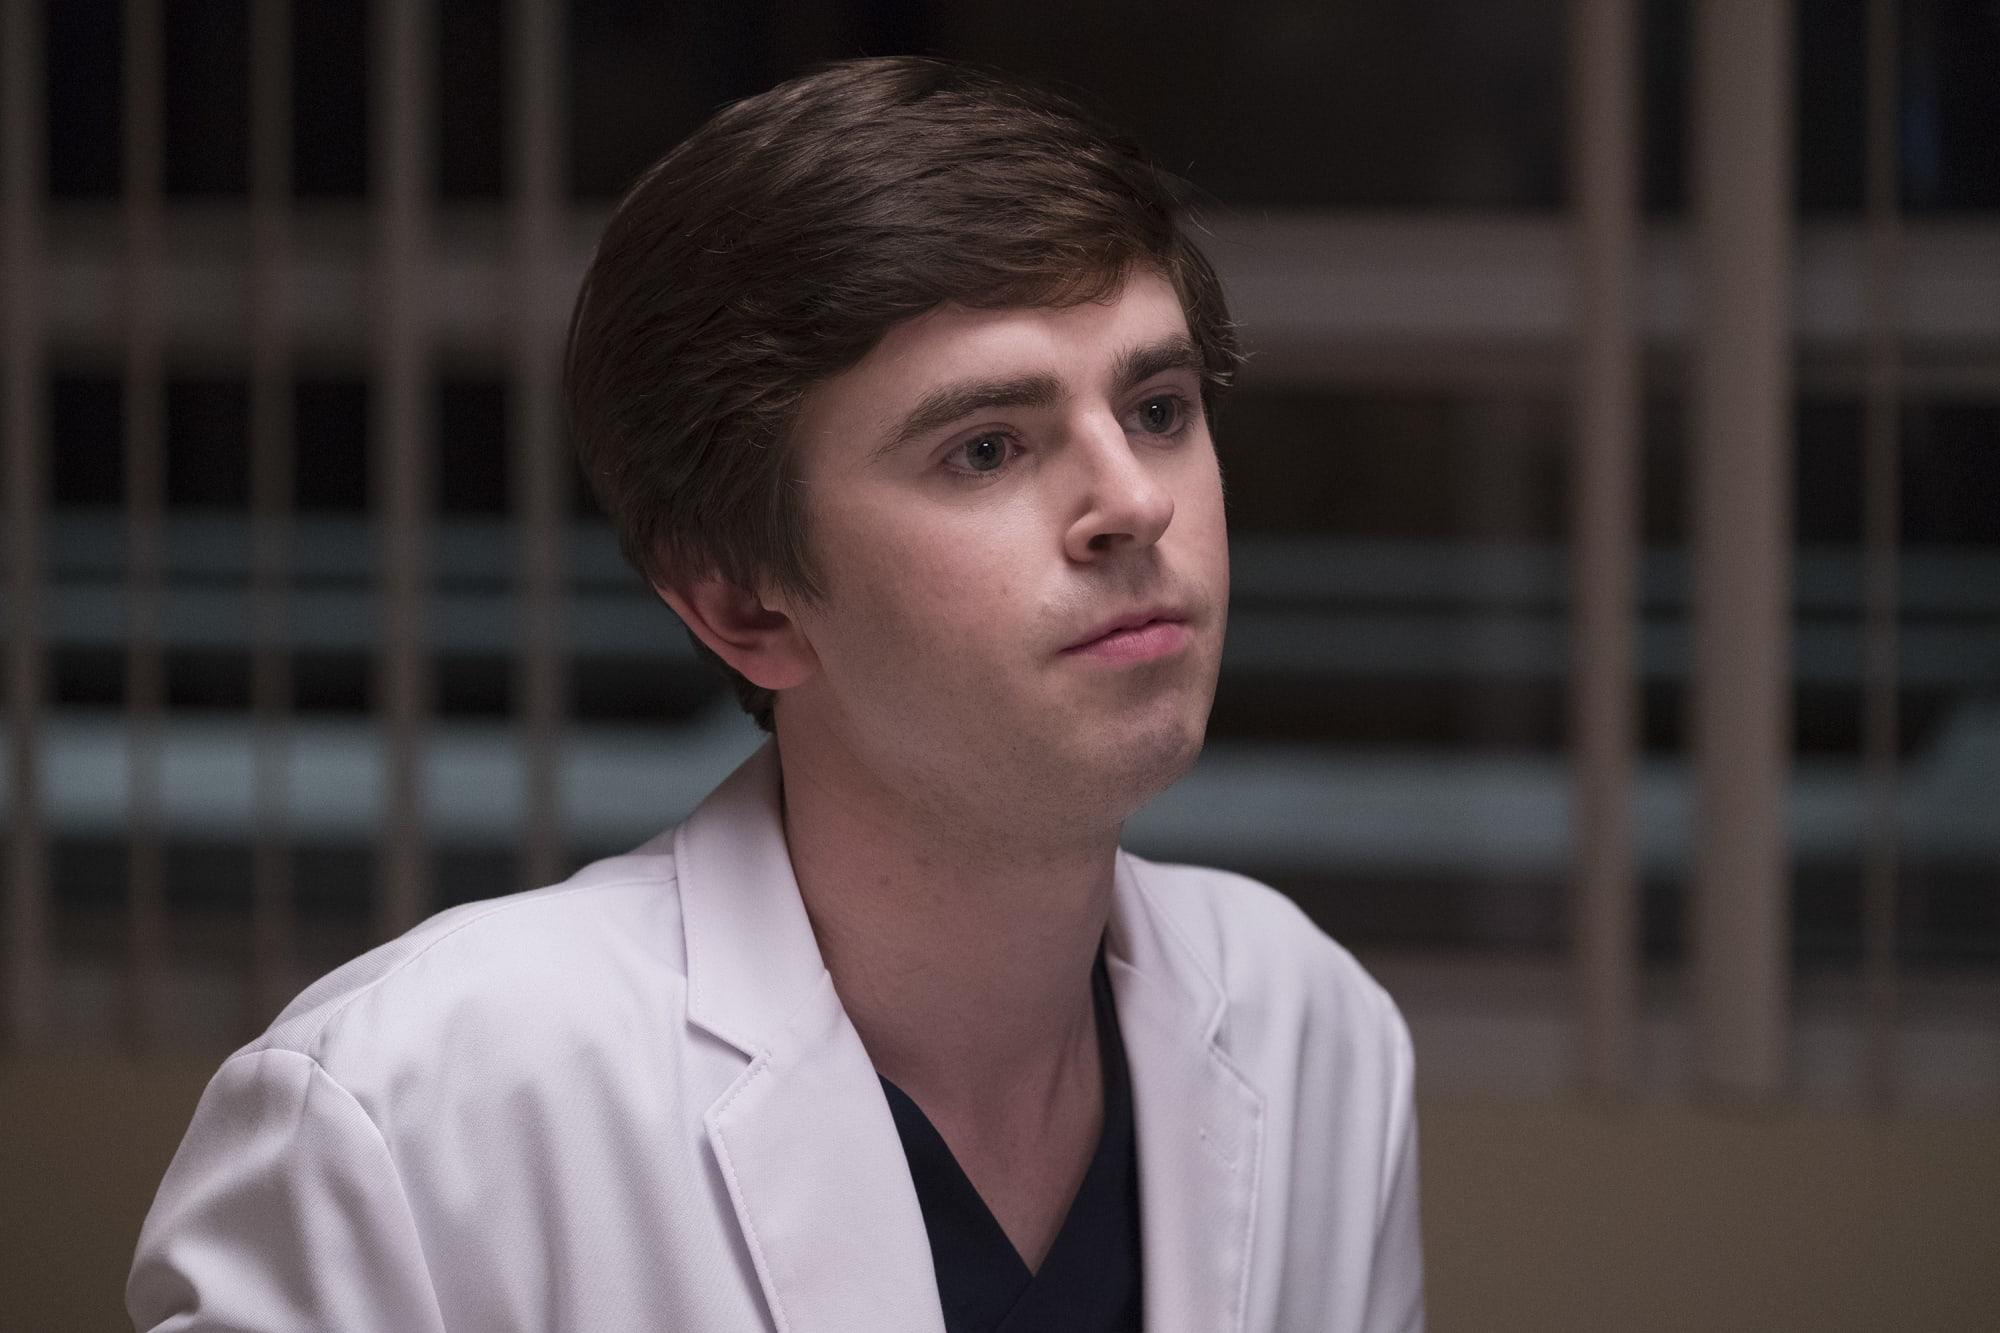 The Good Doctor Season 4 release date, cast, trailer